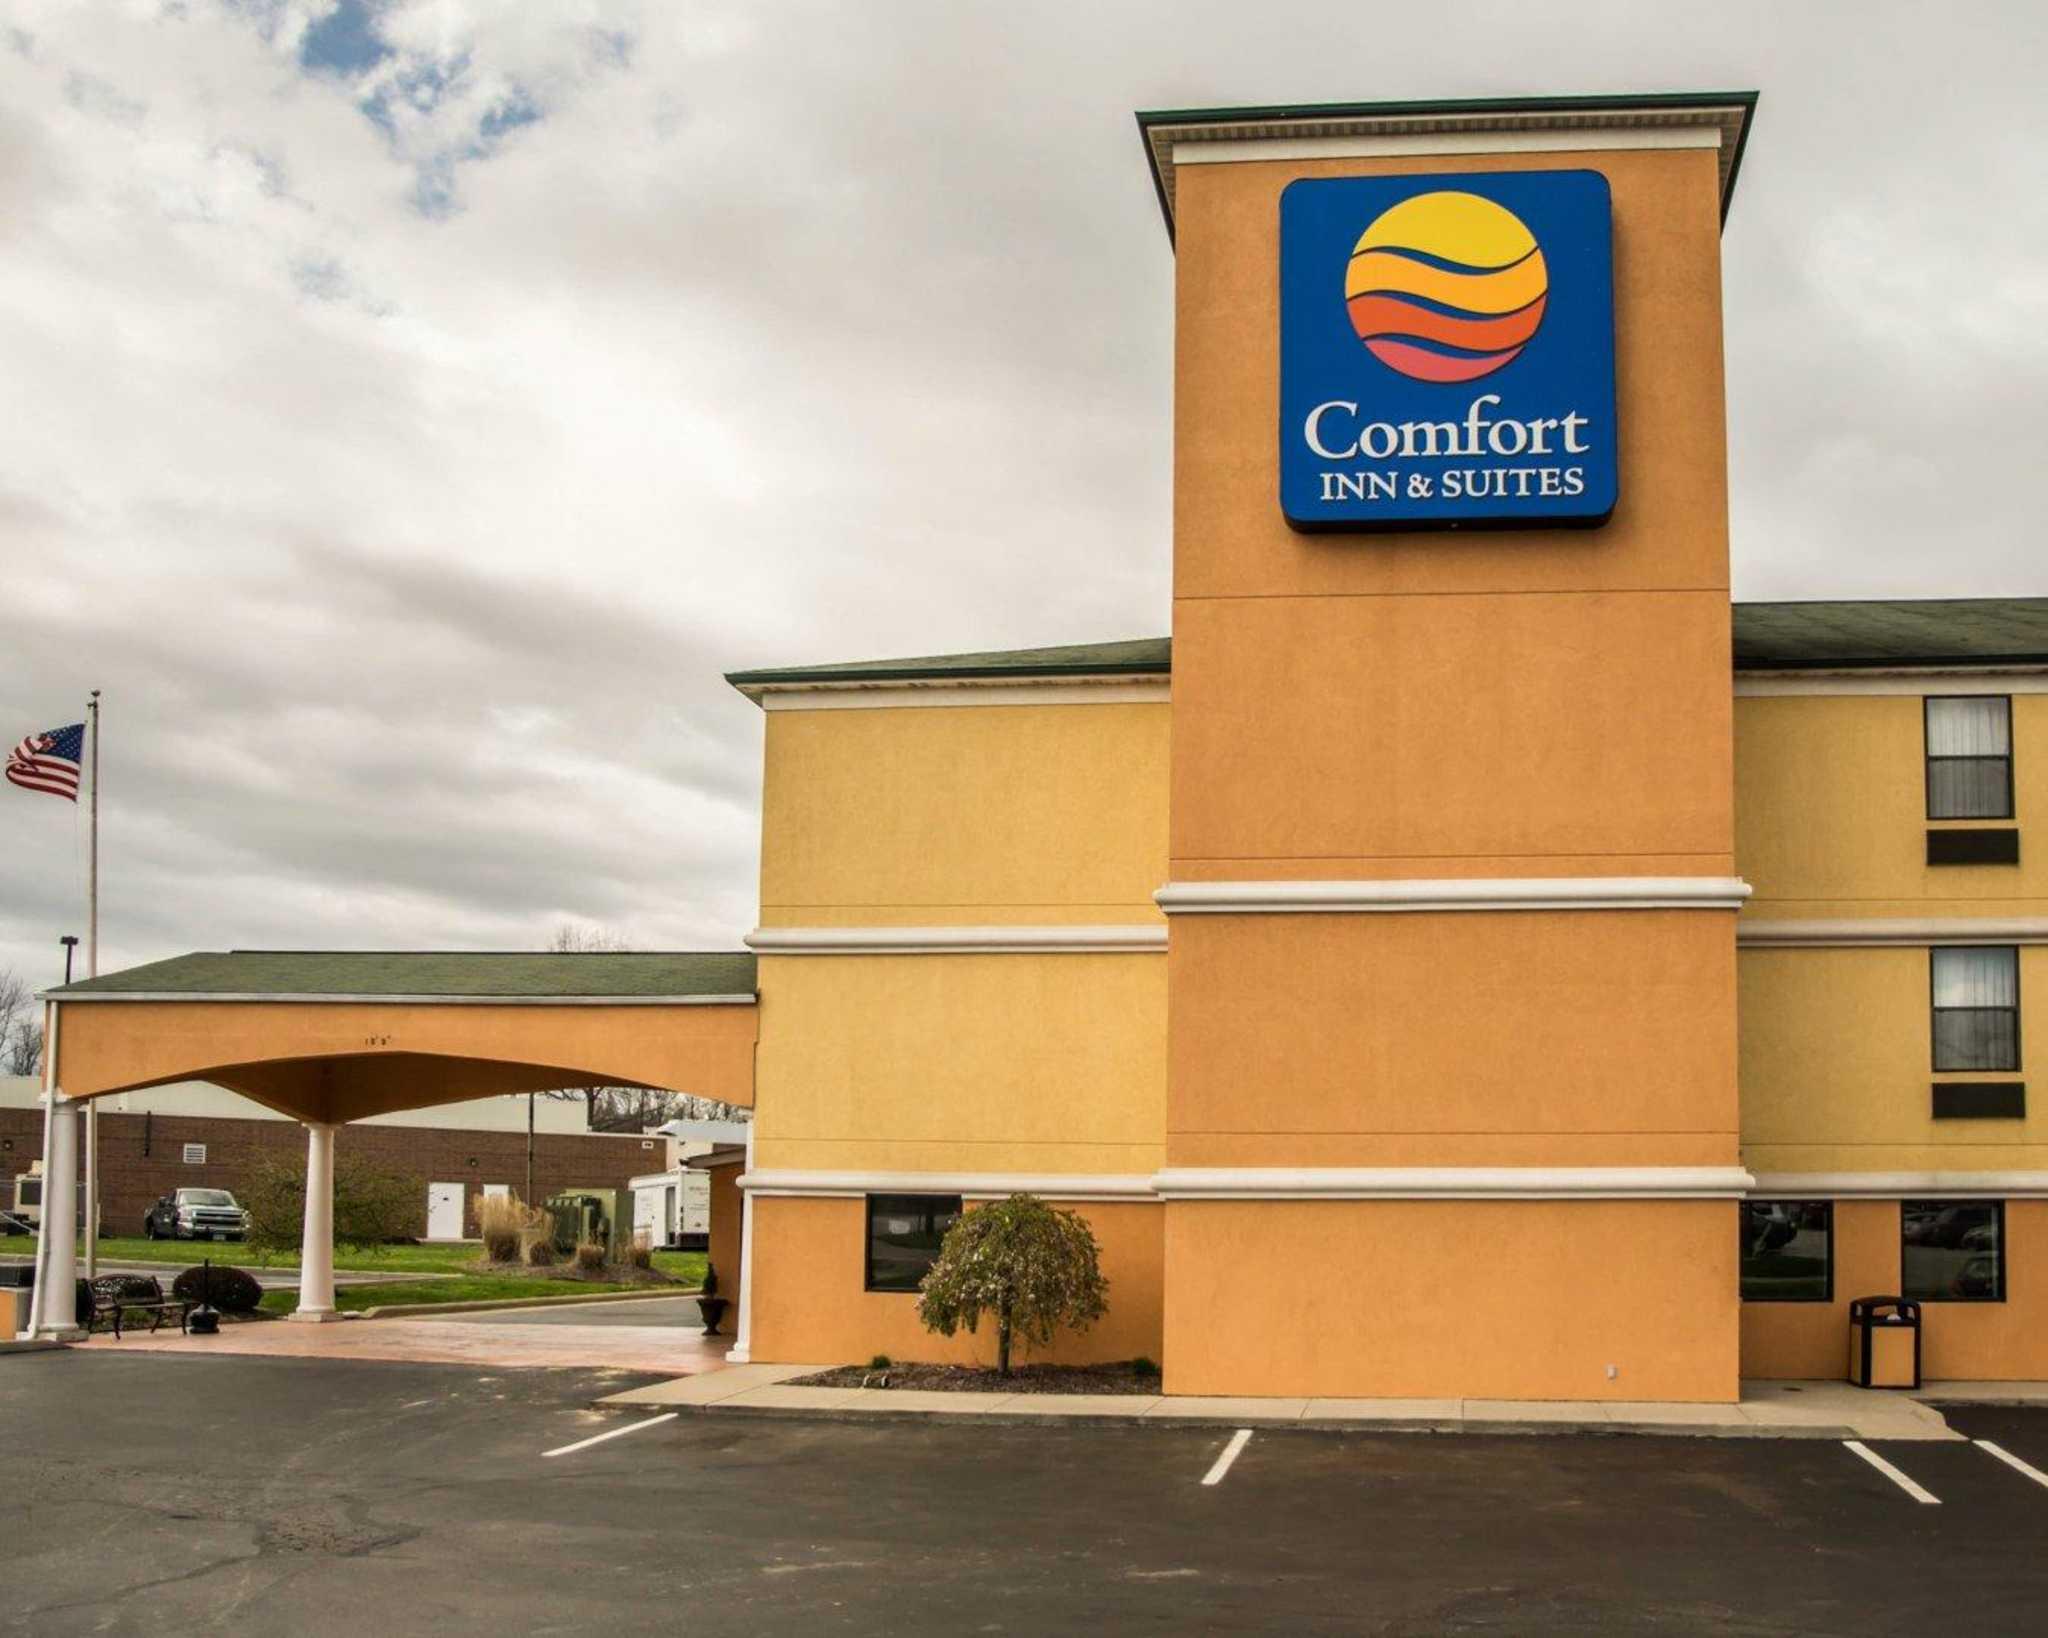 Comfort inn suites coupon code 2018